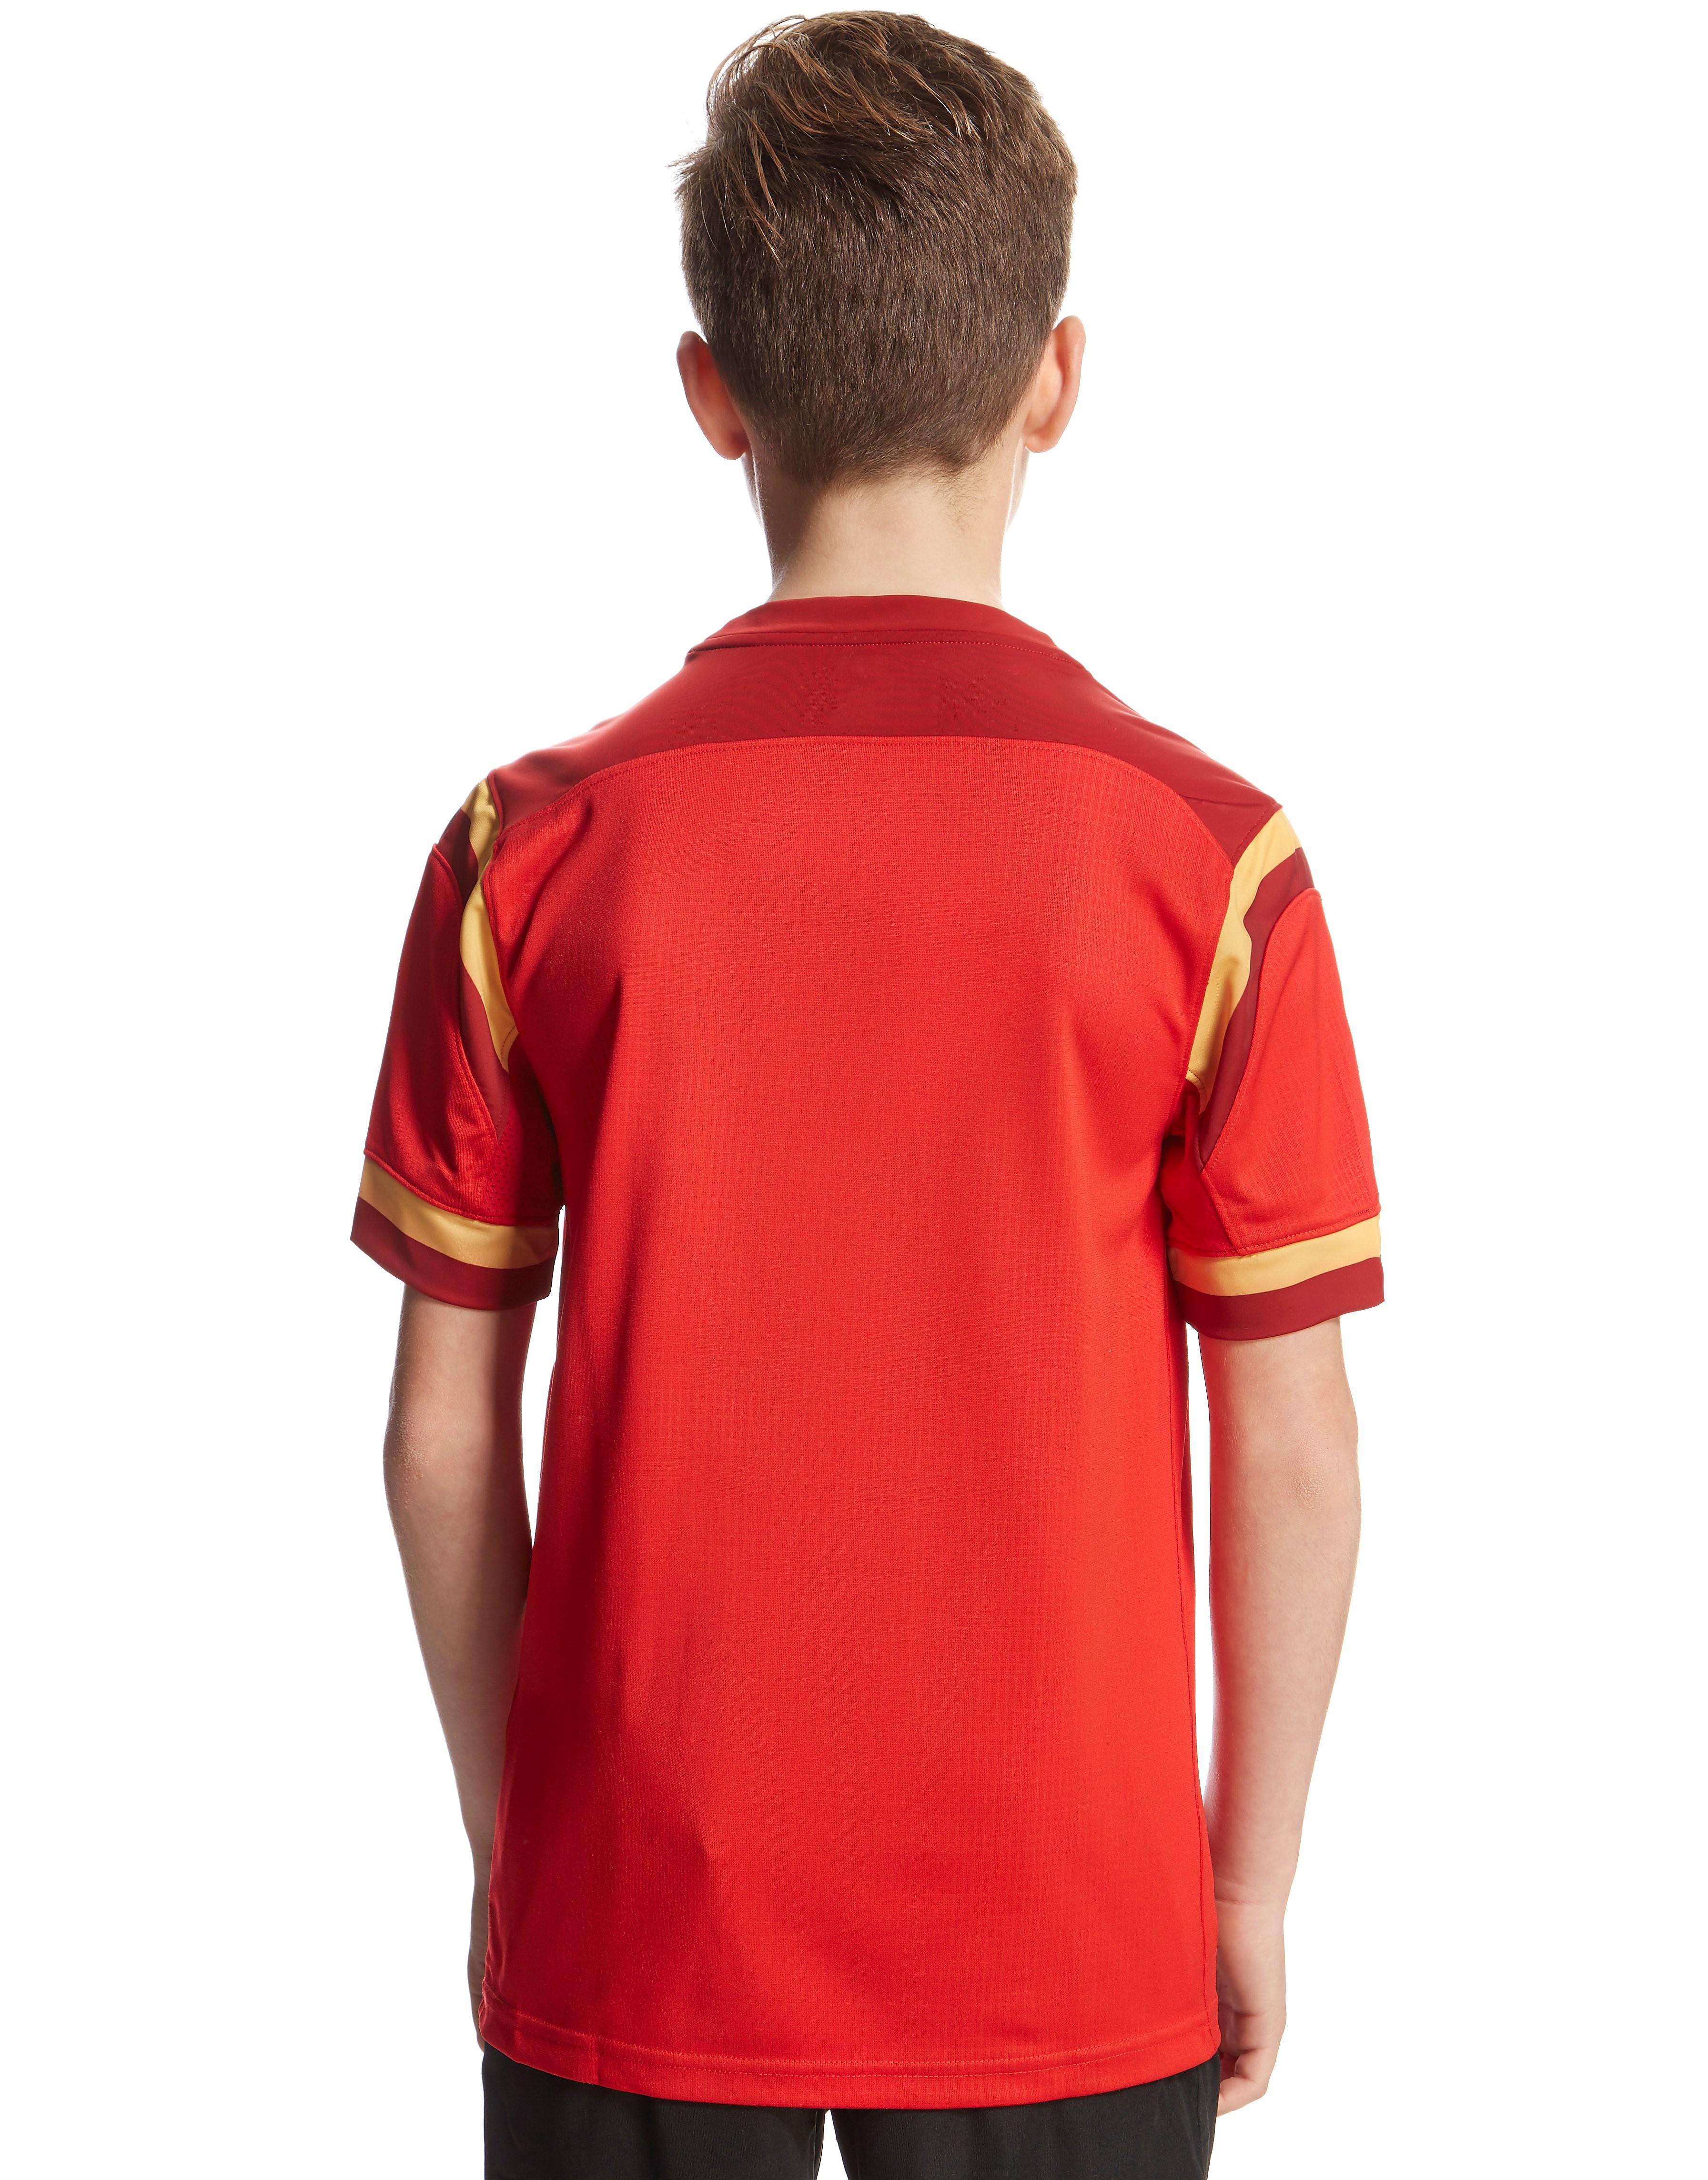 Under Armour Wales RU Home 2015/16 Shirt Junior